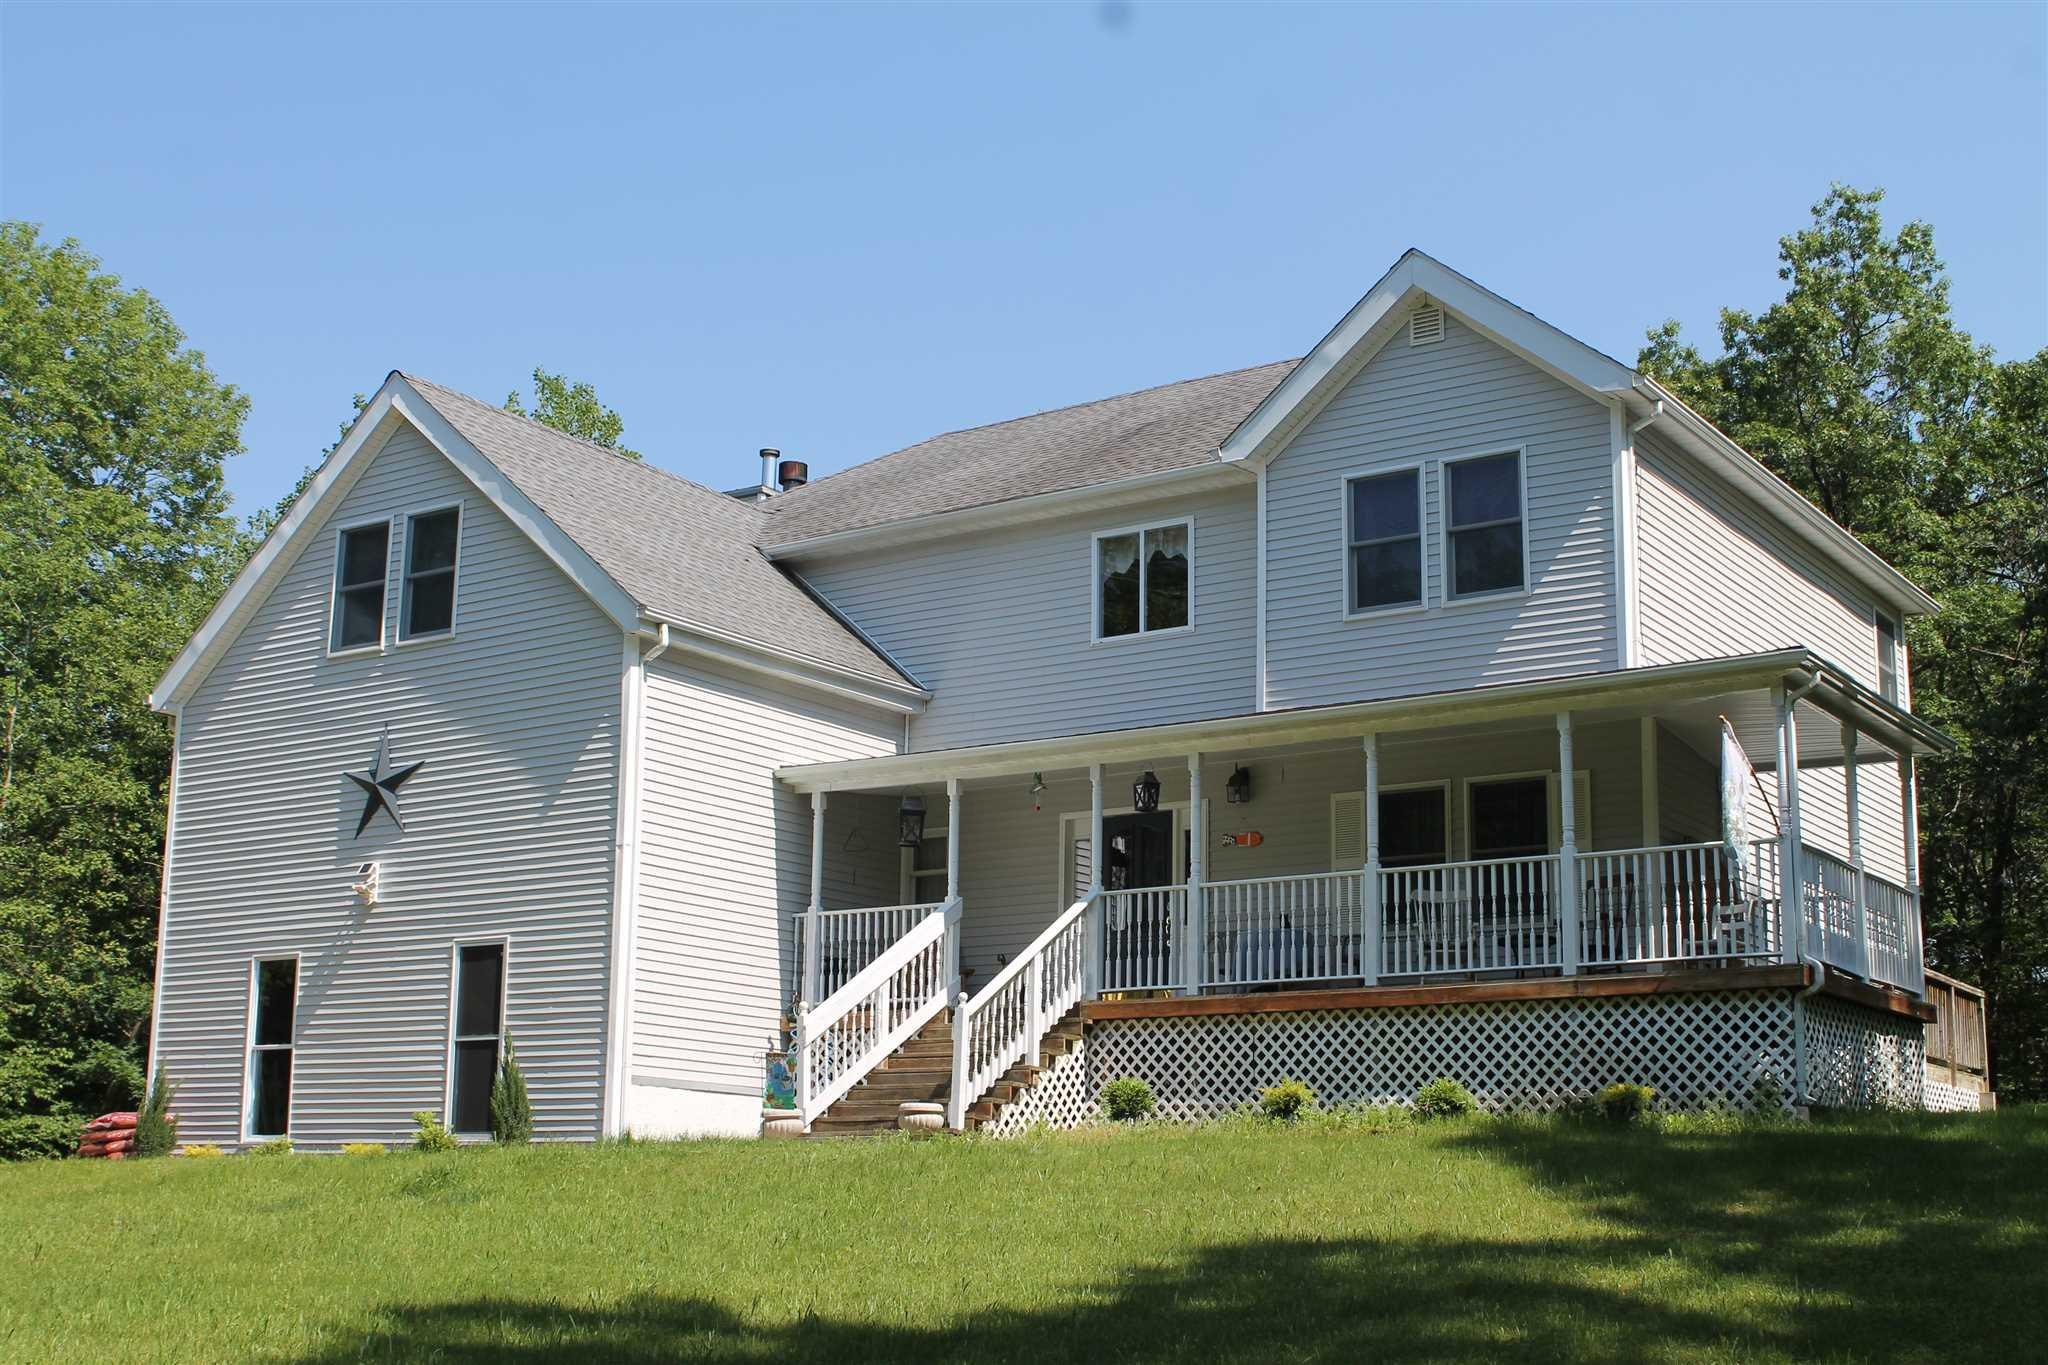 500 HICKS HILL RD, Pine Plains, NY 12581